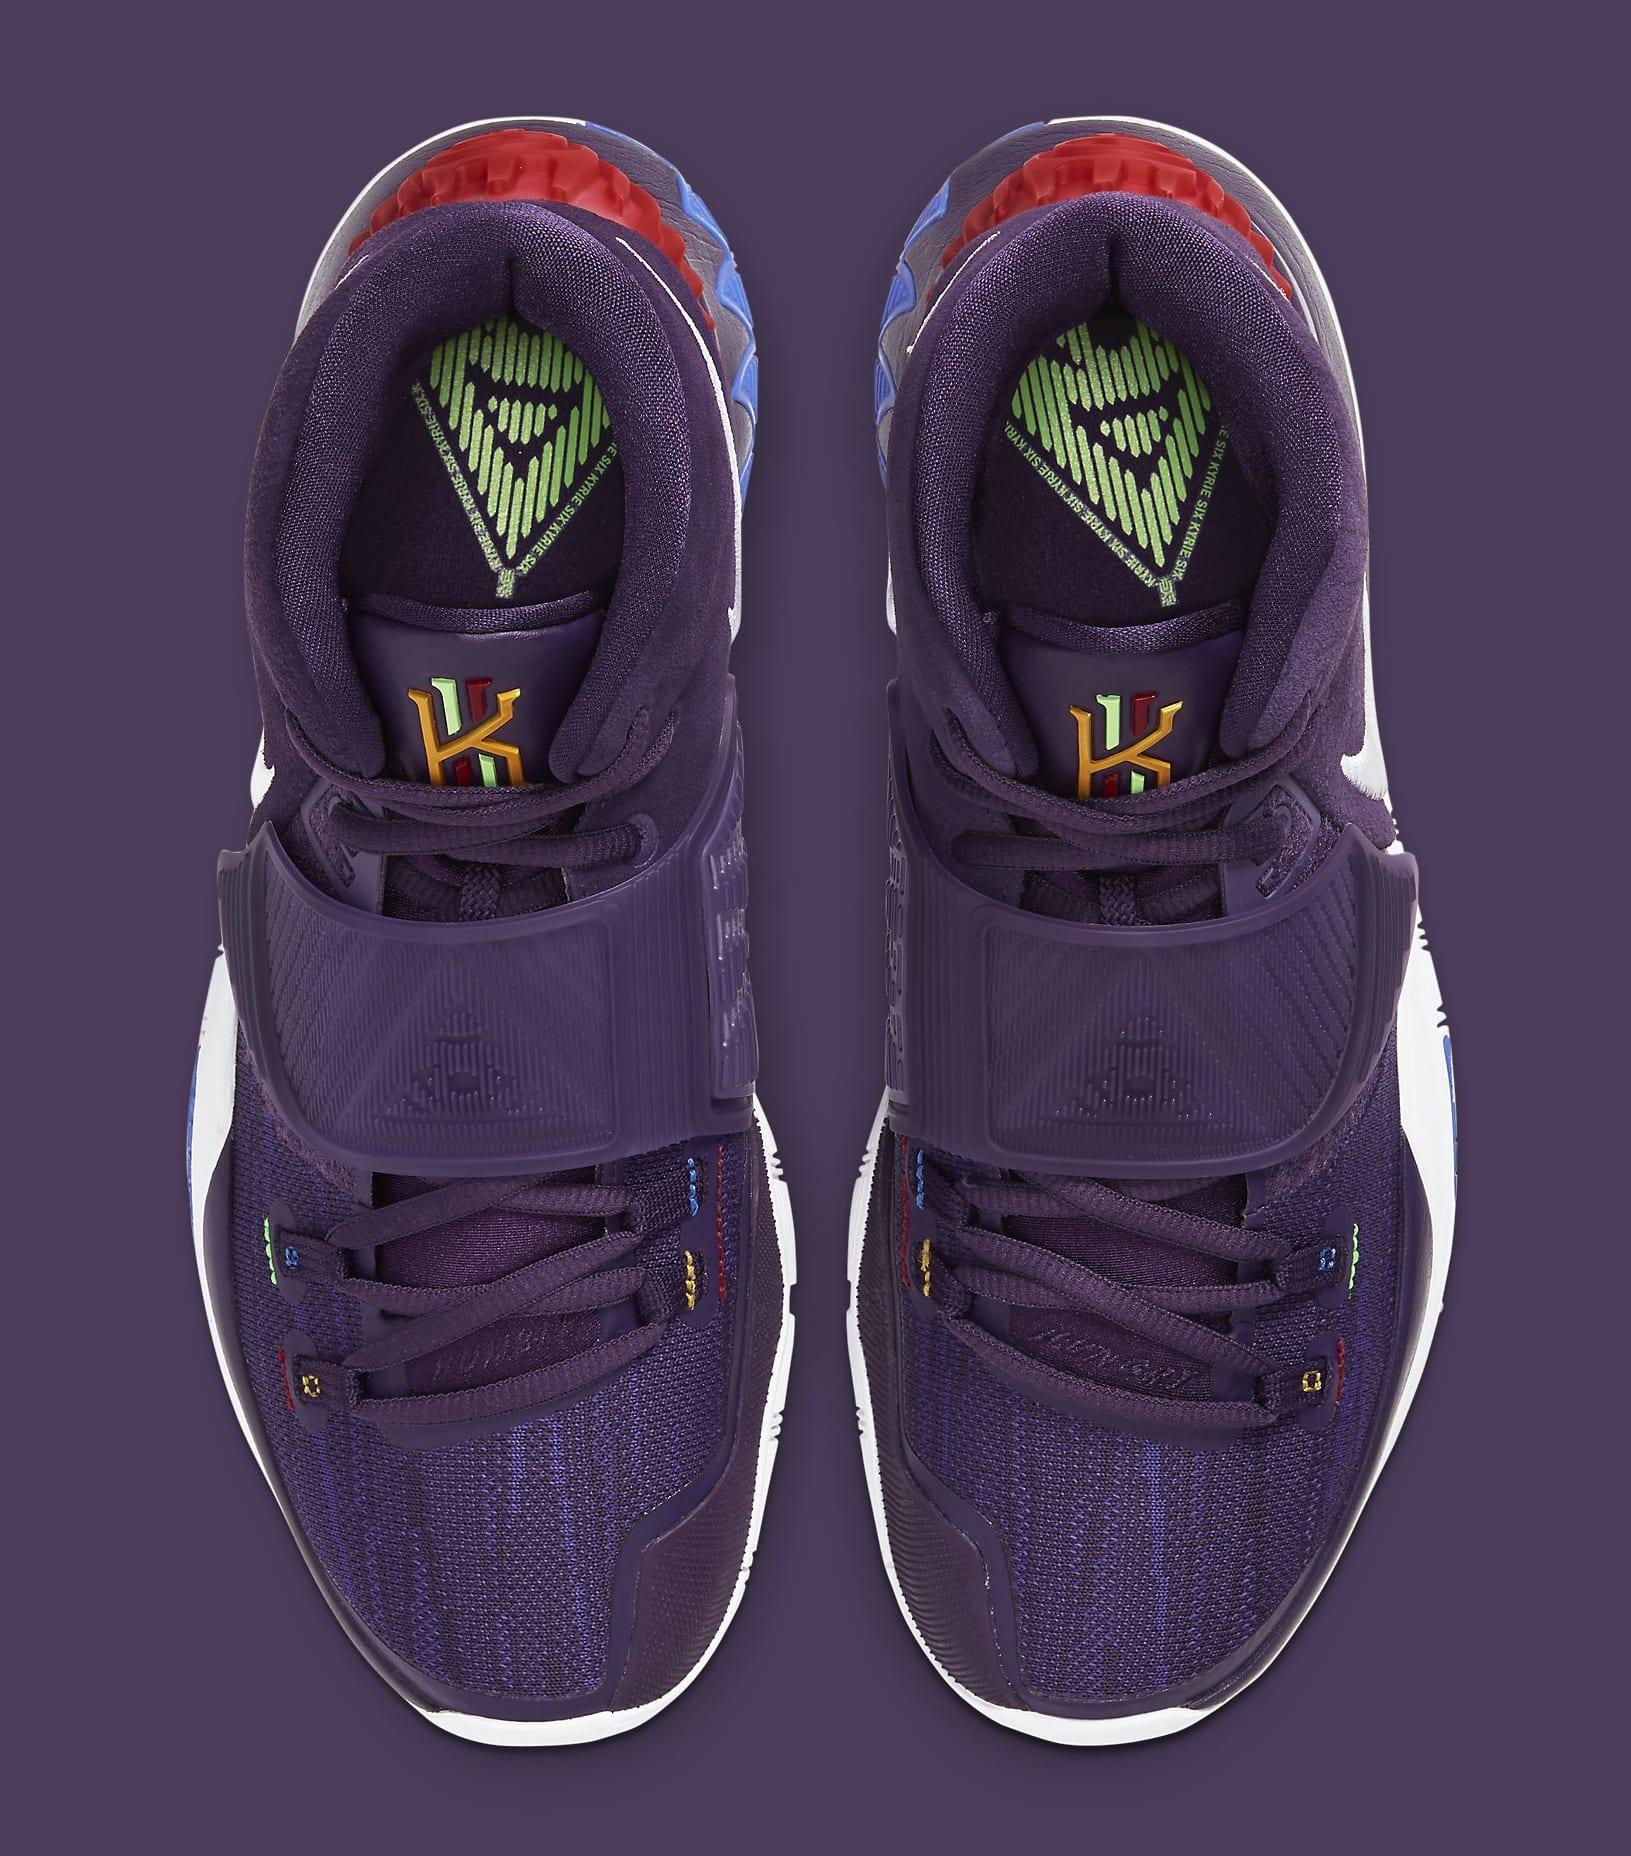 nike-kyrie-6-grand-purple-bq4630-500-top